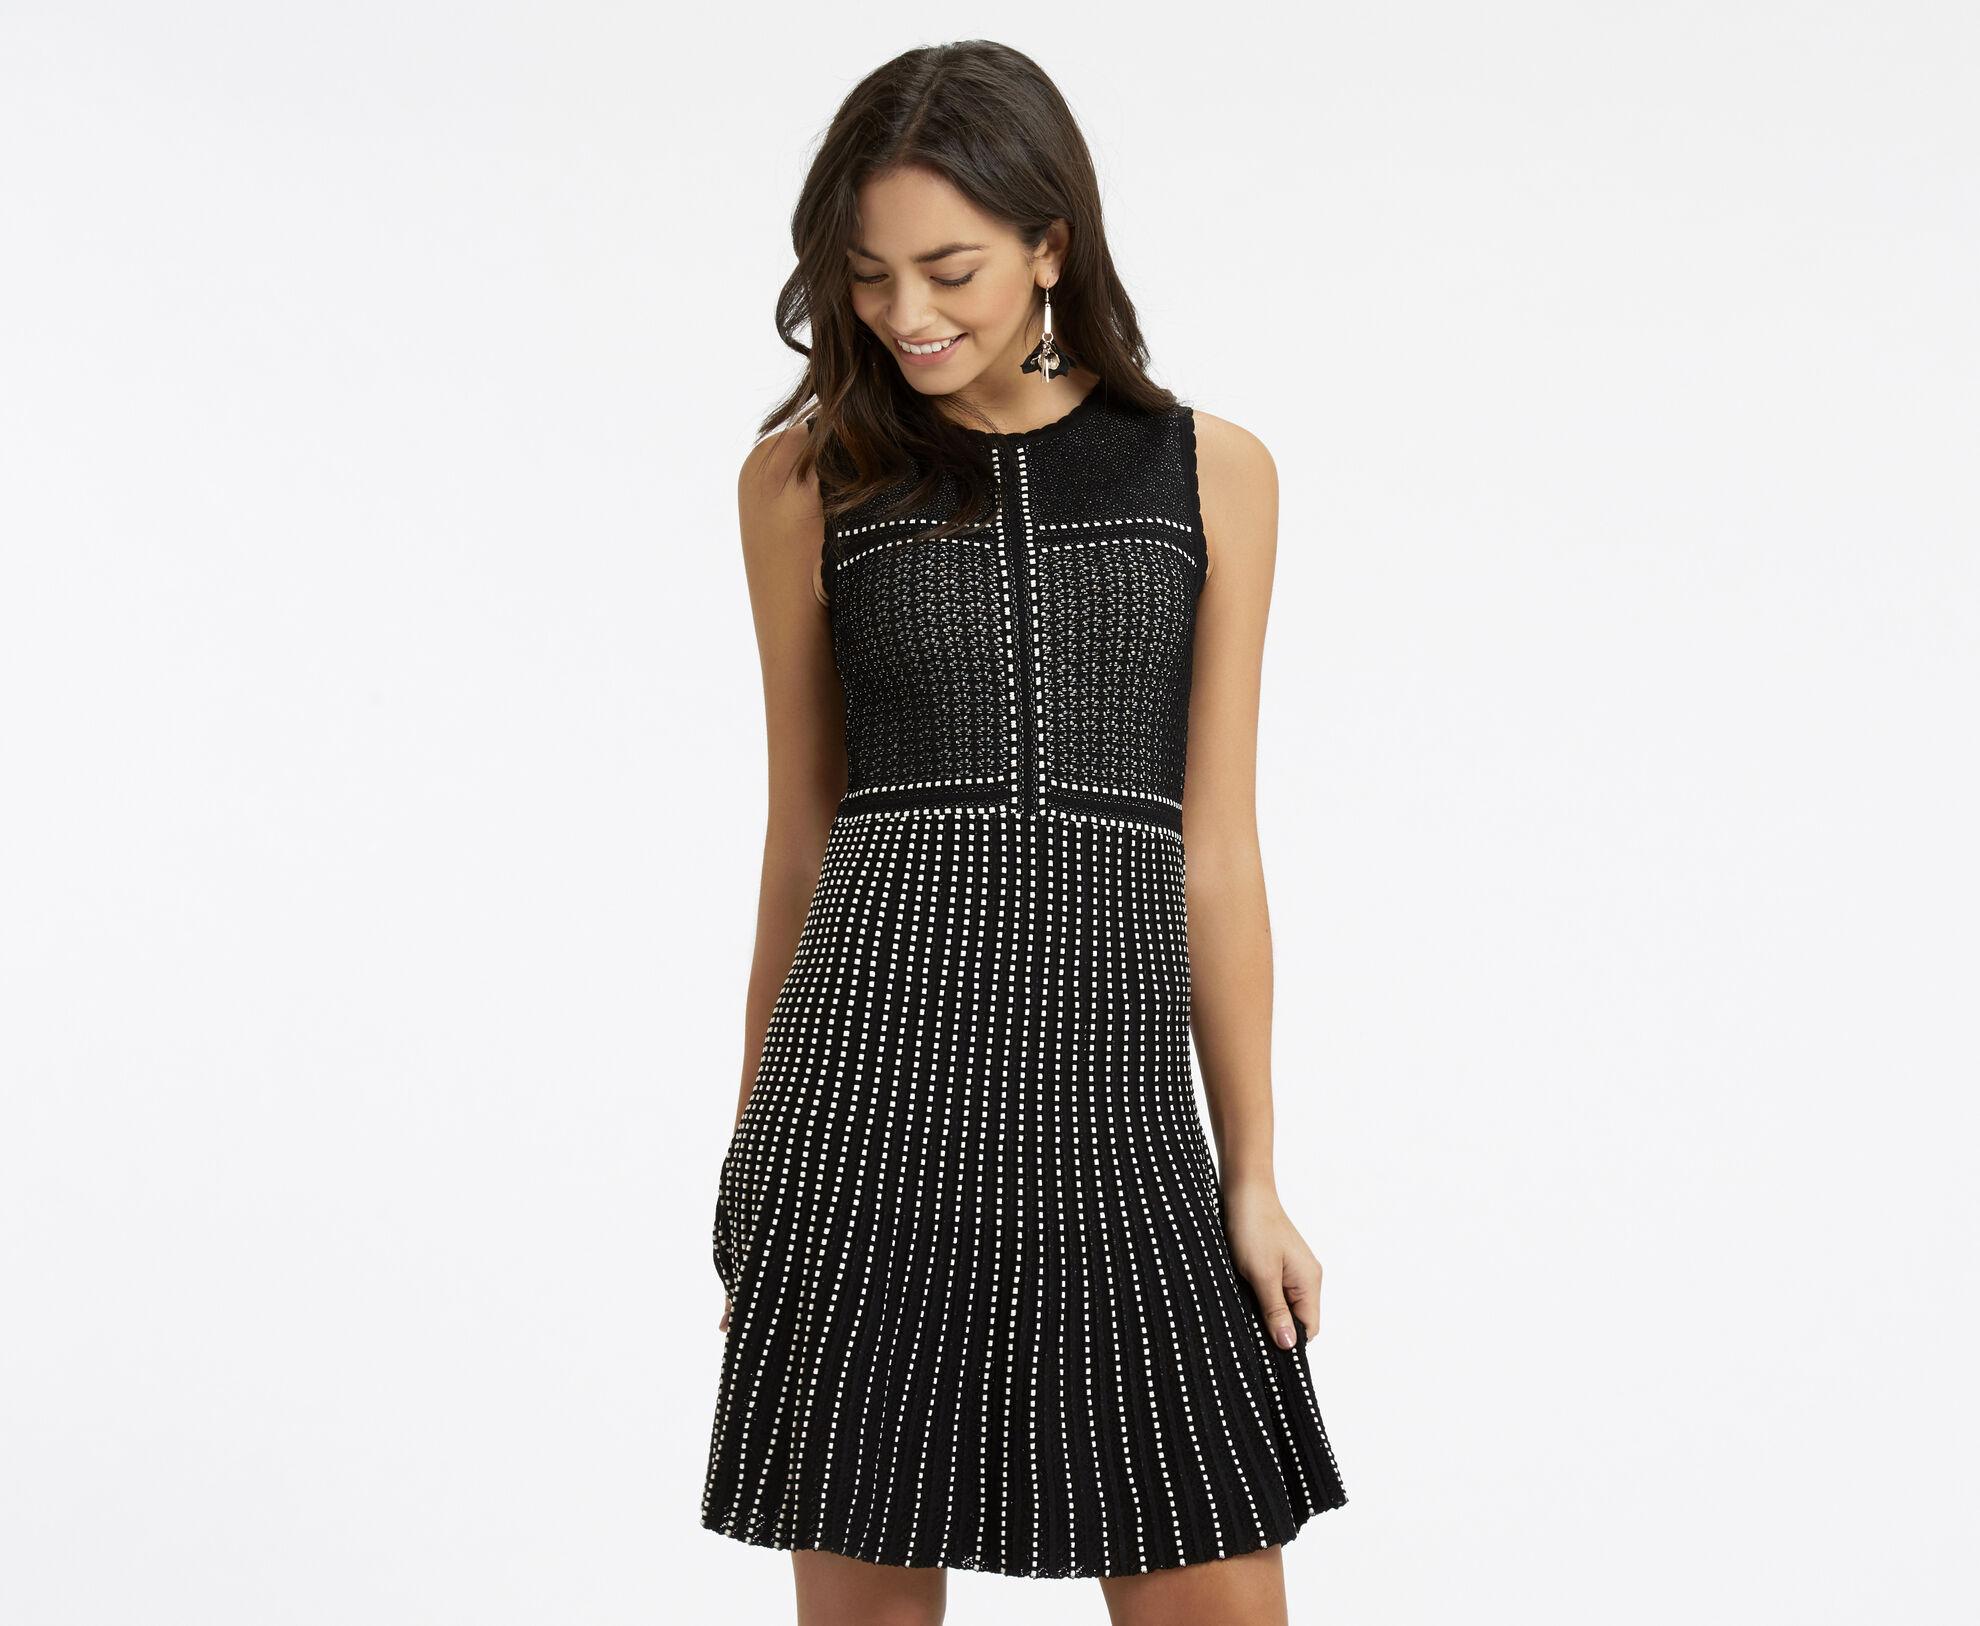 Oasis, Lace Compact Statement Dress Black 1